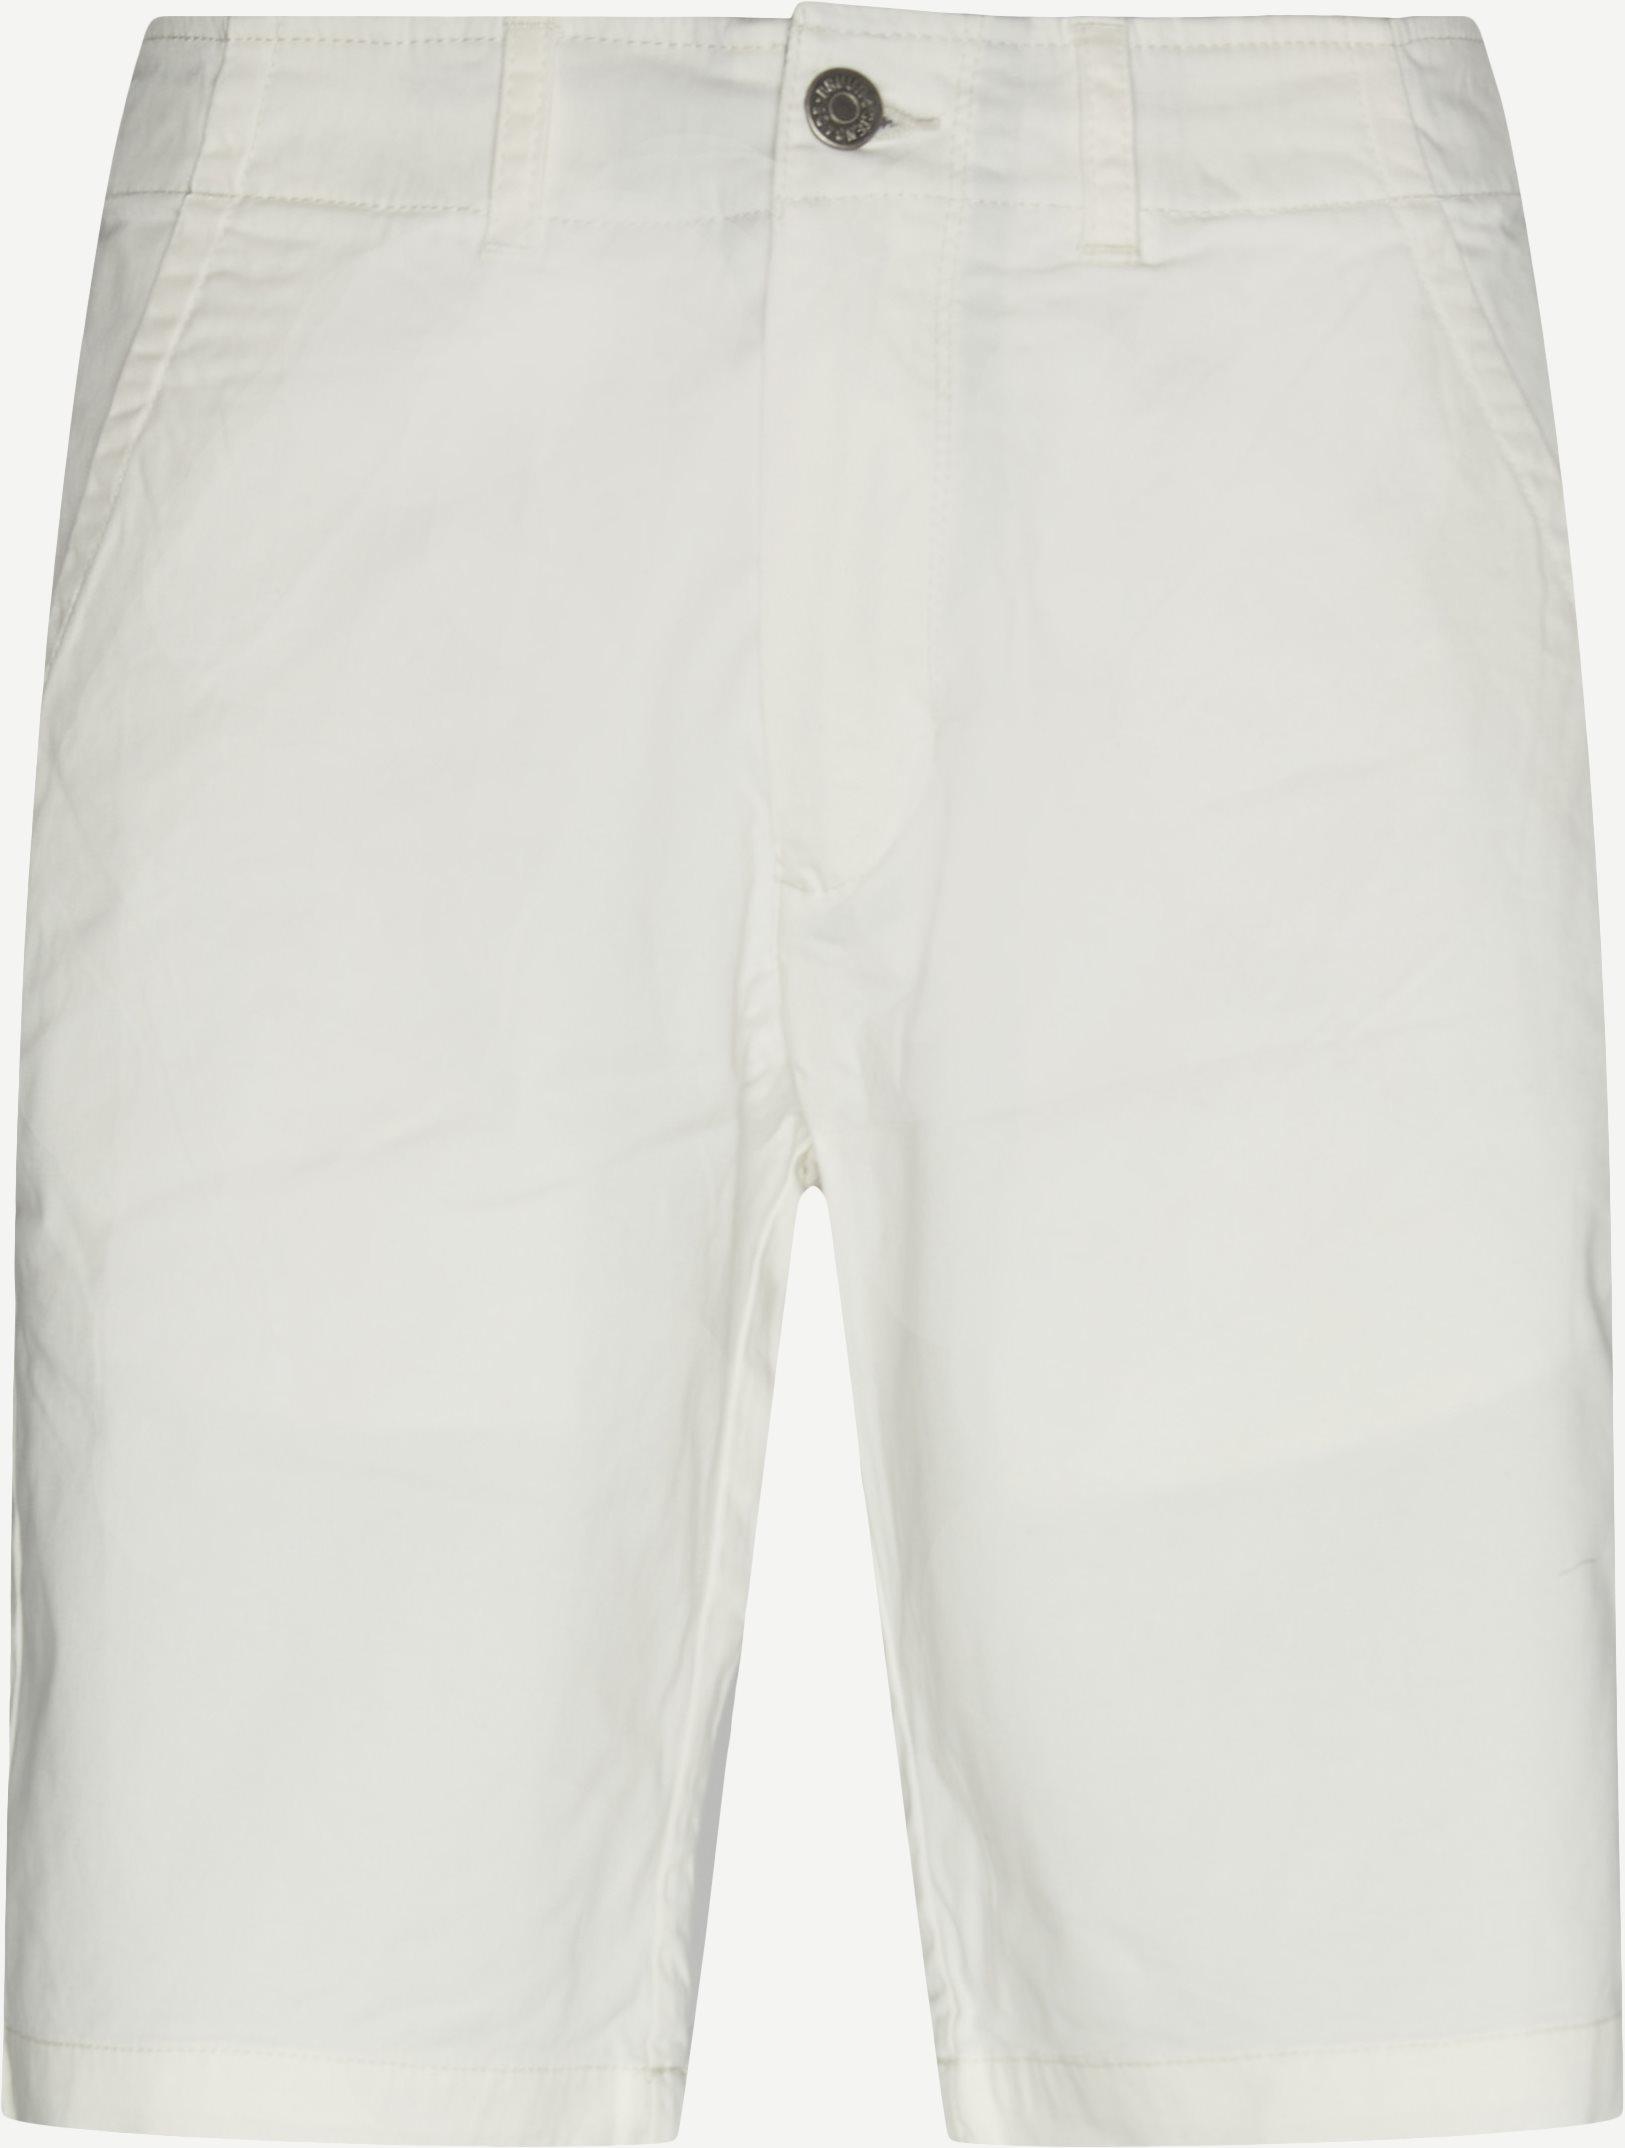 Shorts - Regular - Weiß